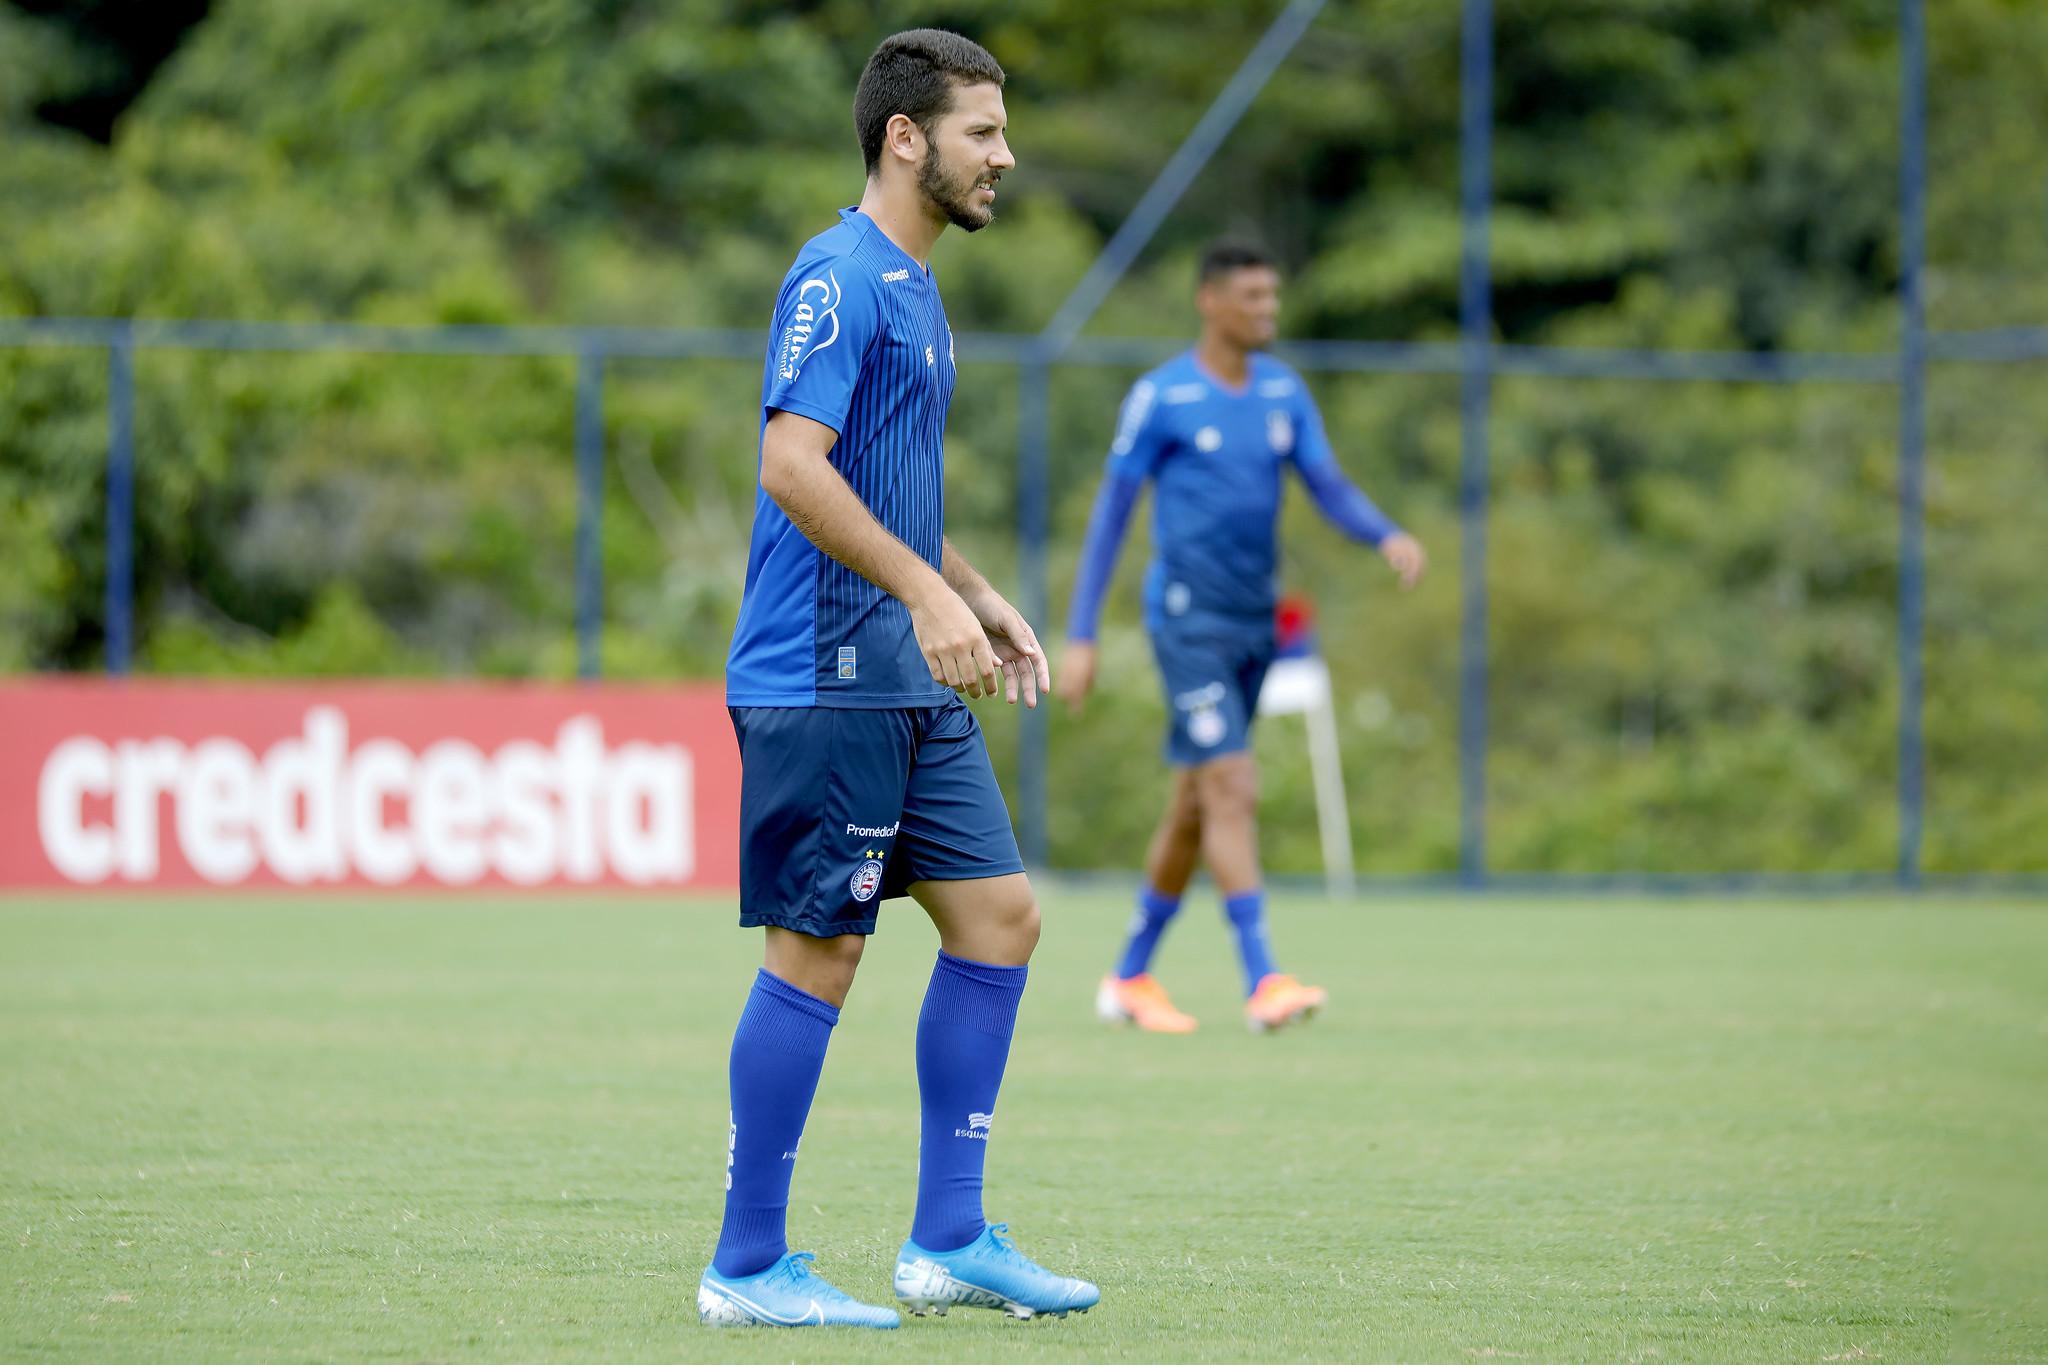 Lucas Rodrigues, lateral direito, veio do Comercial-SP